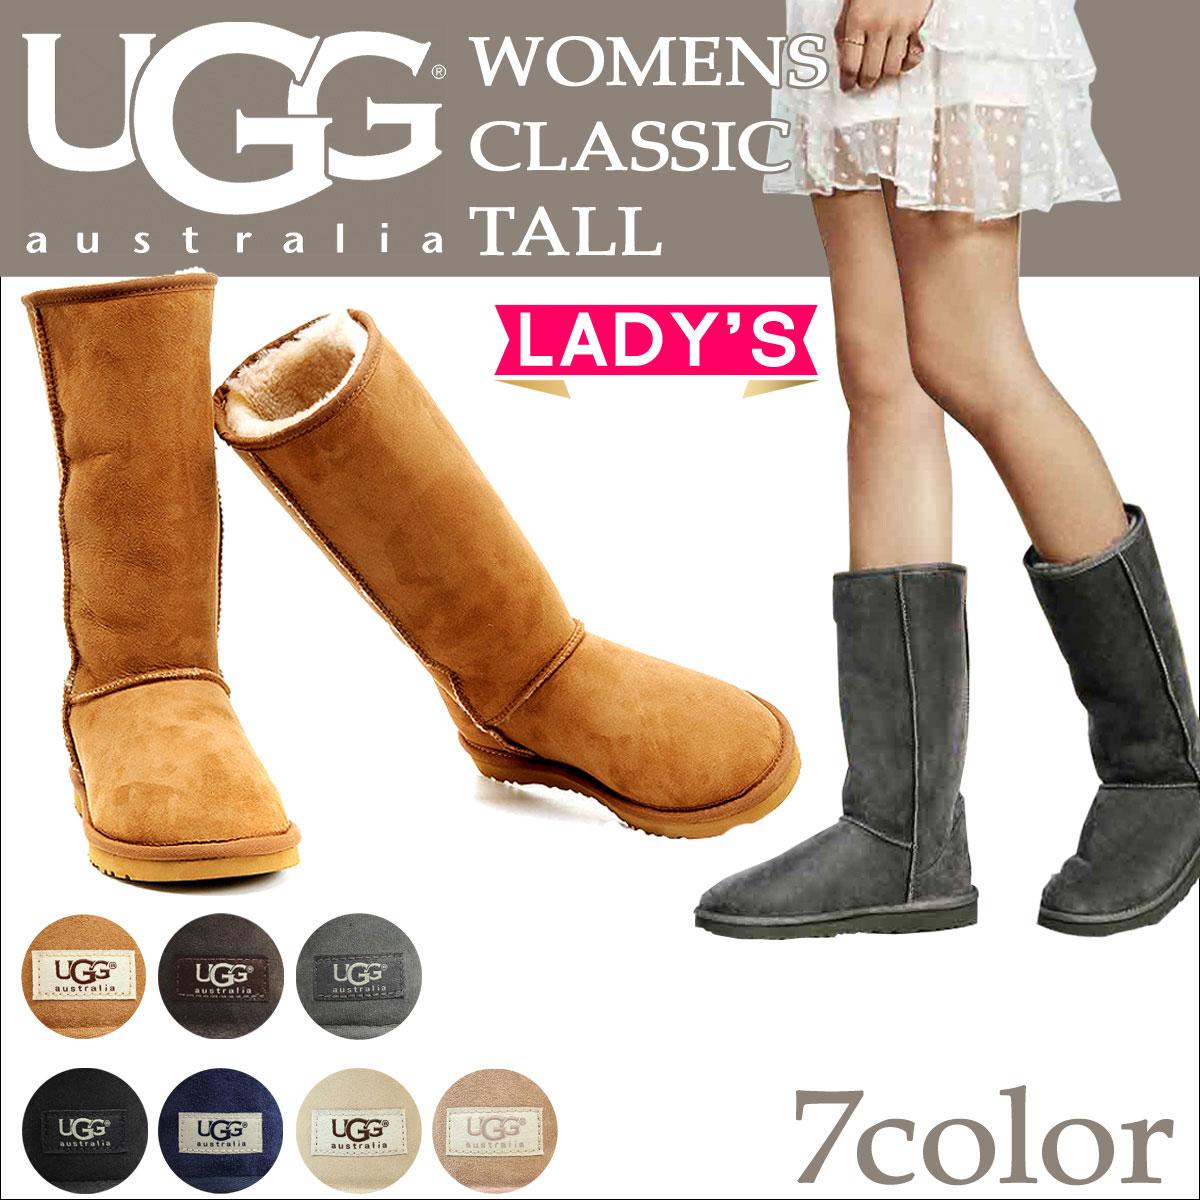 ugg boots 36